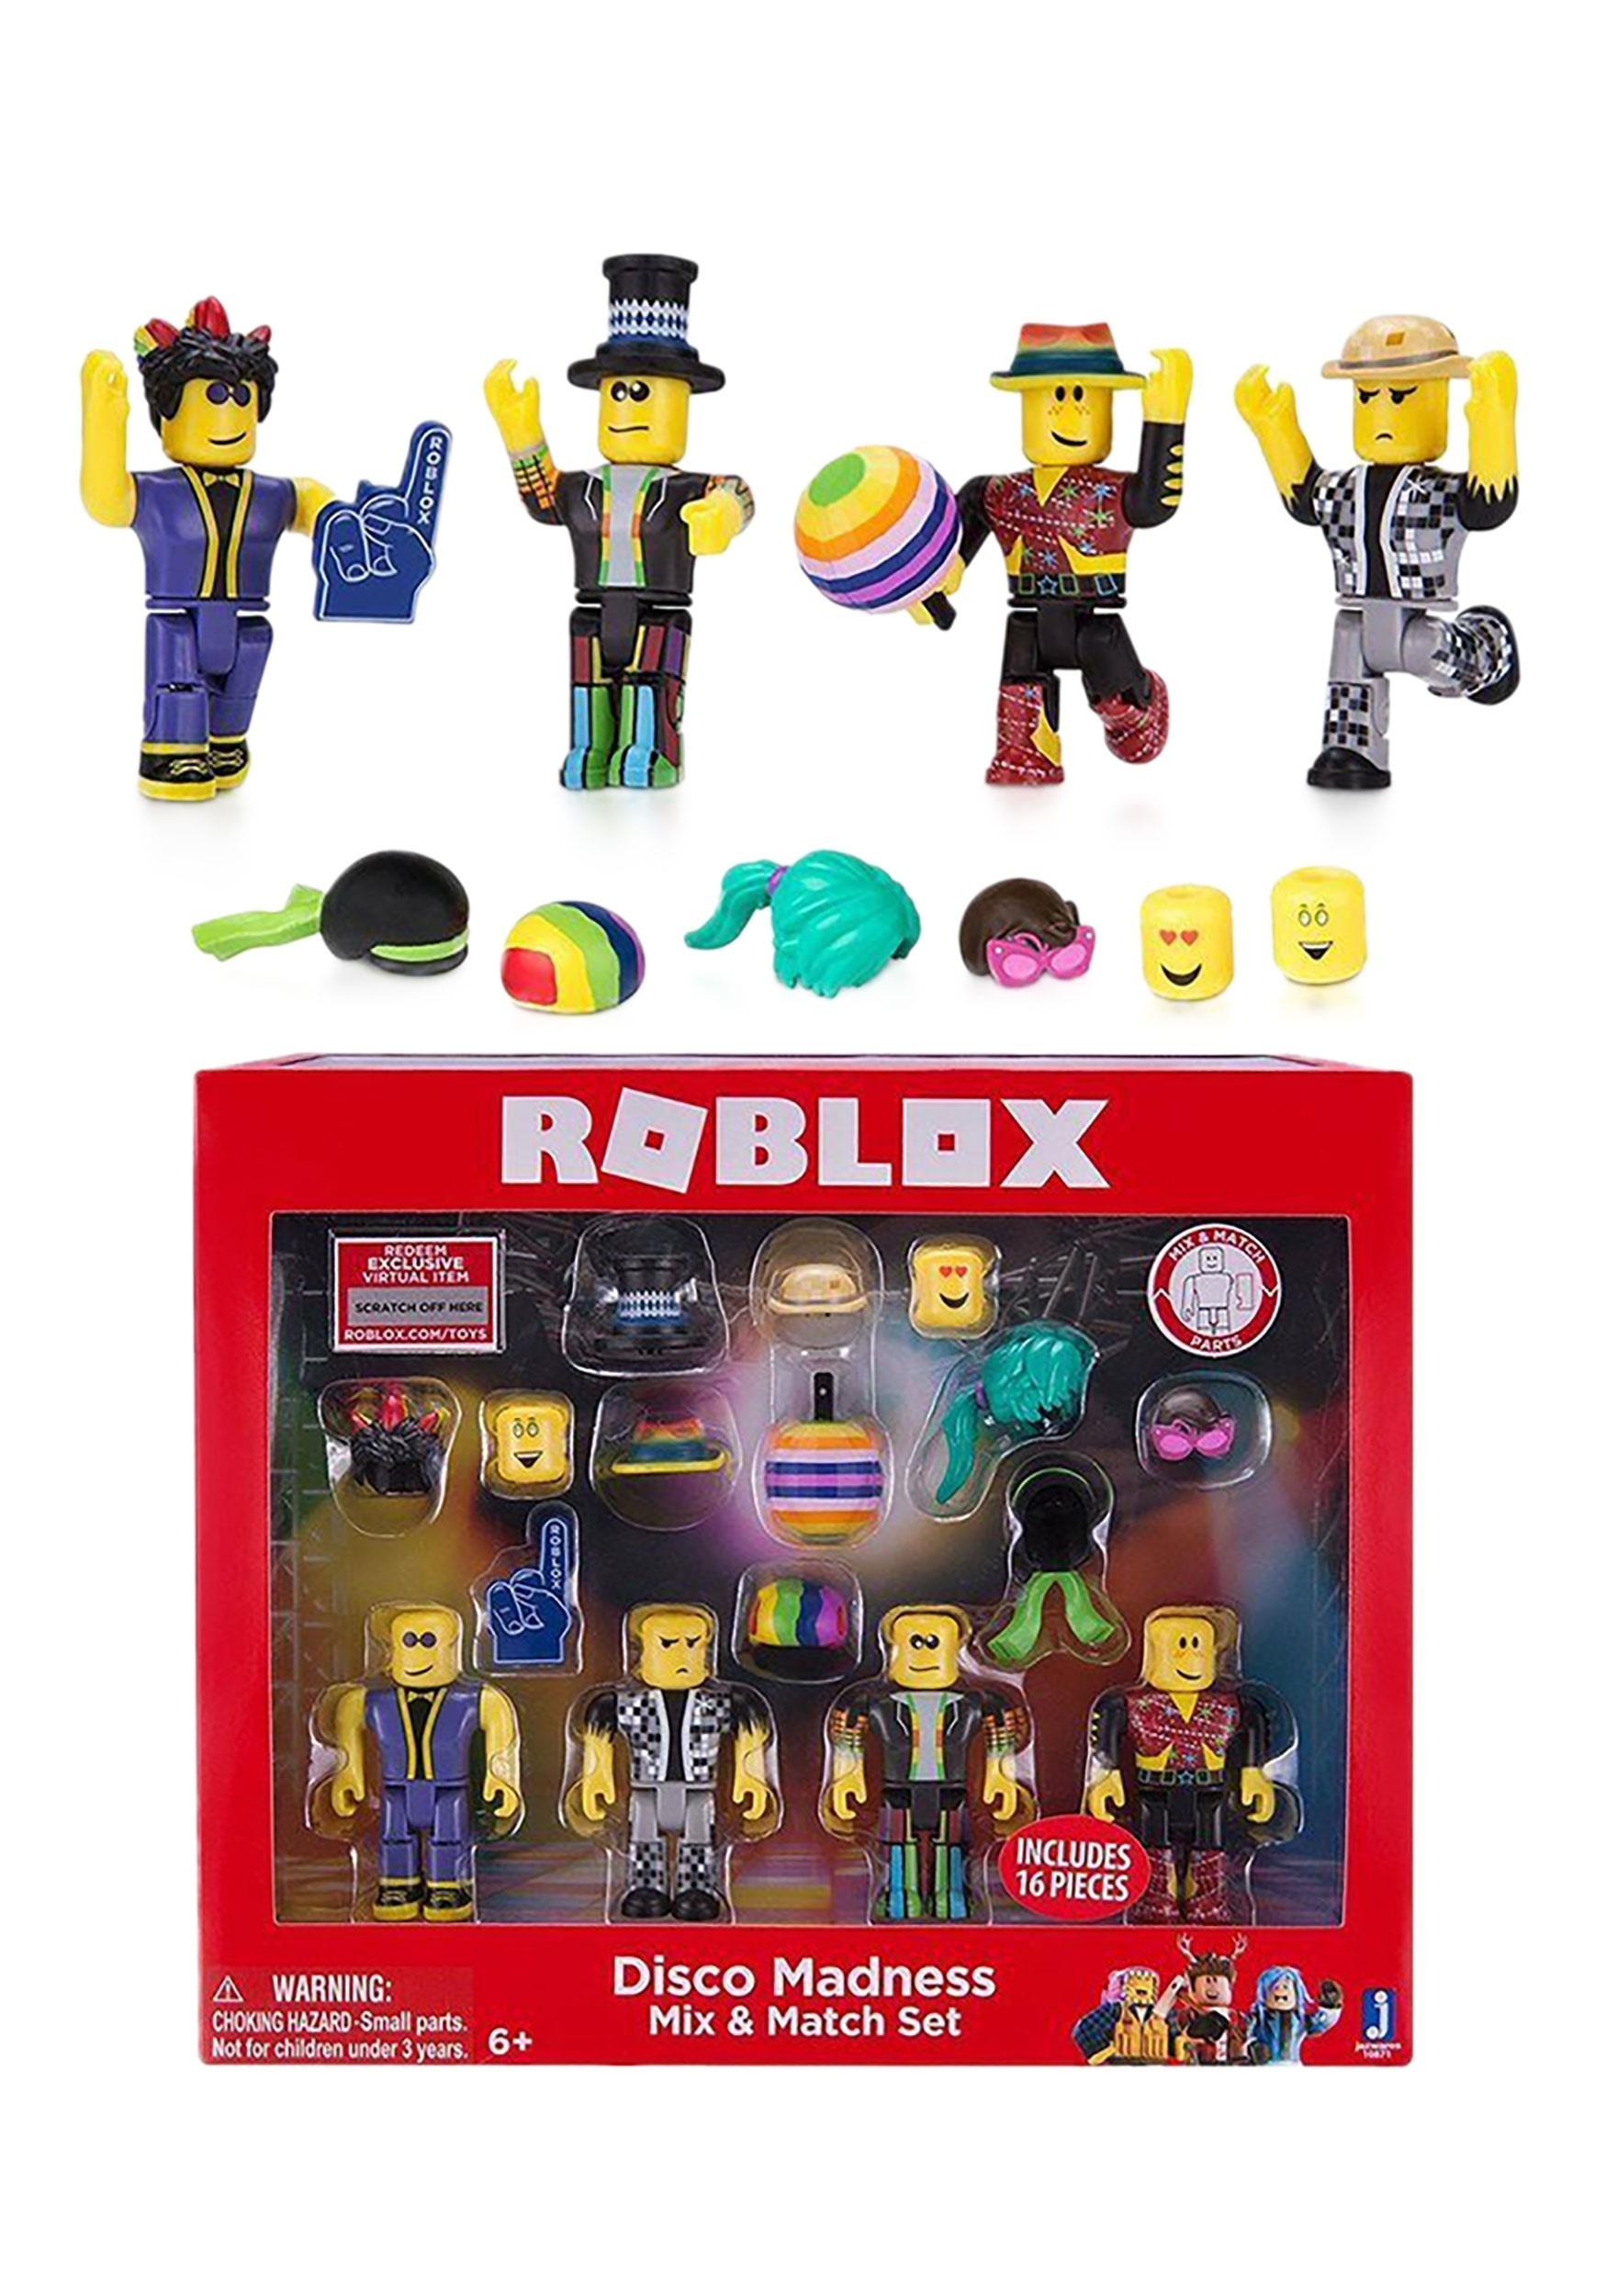 Roblox Disco Madness Mix Match Set - roblox plush set of 4 make your own